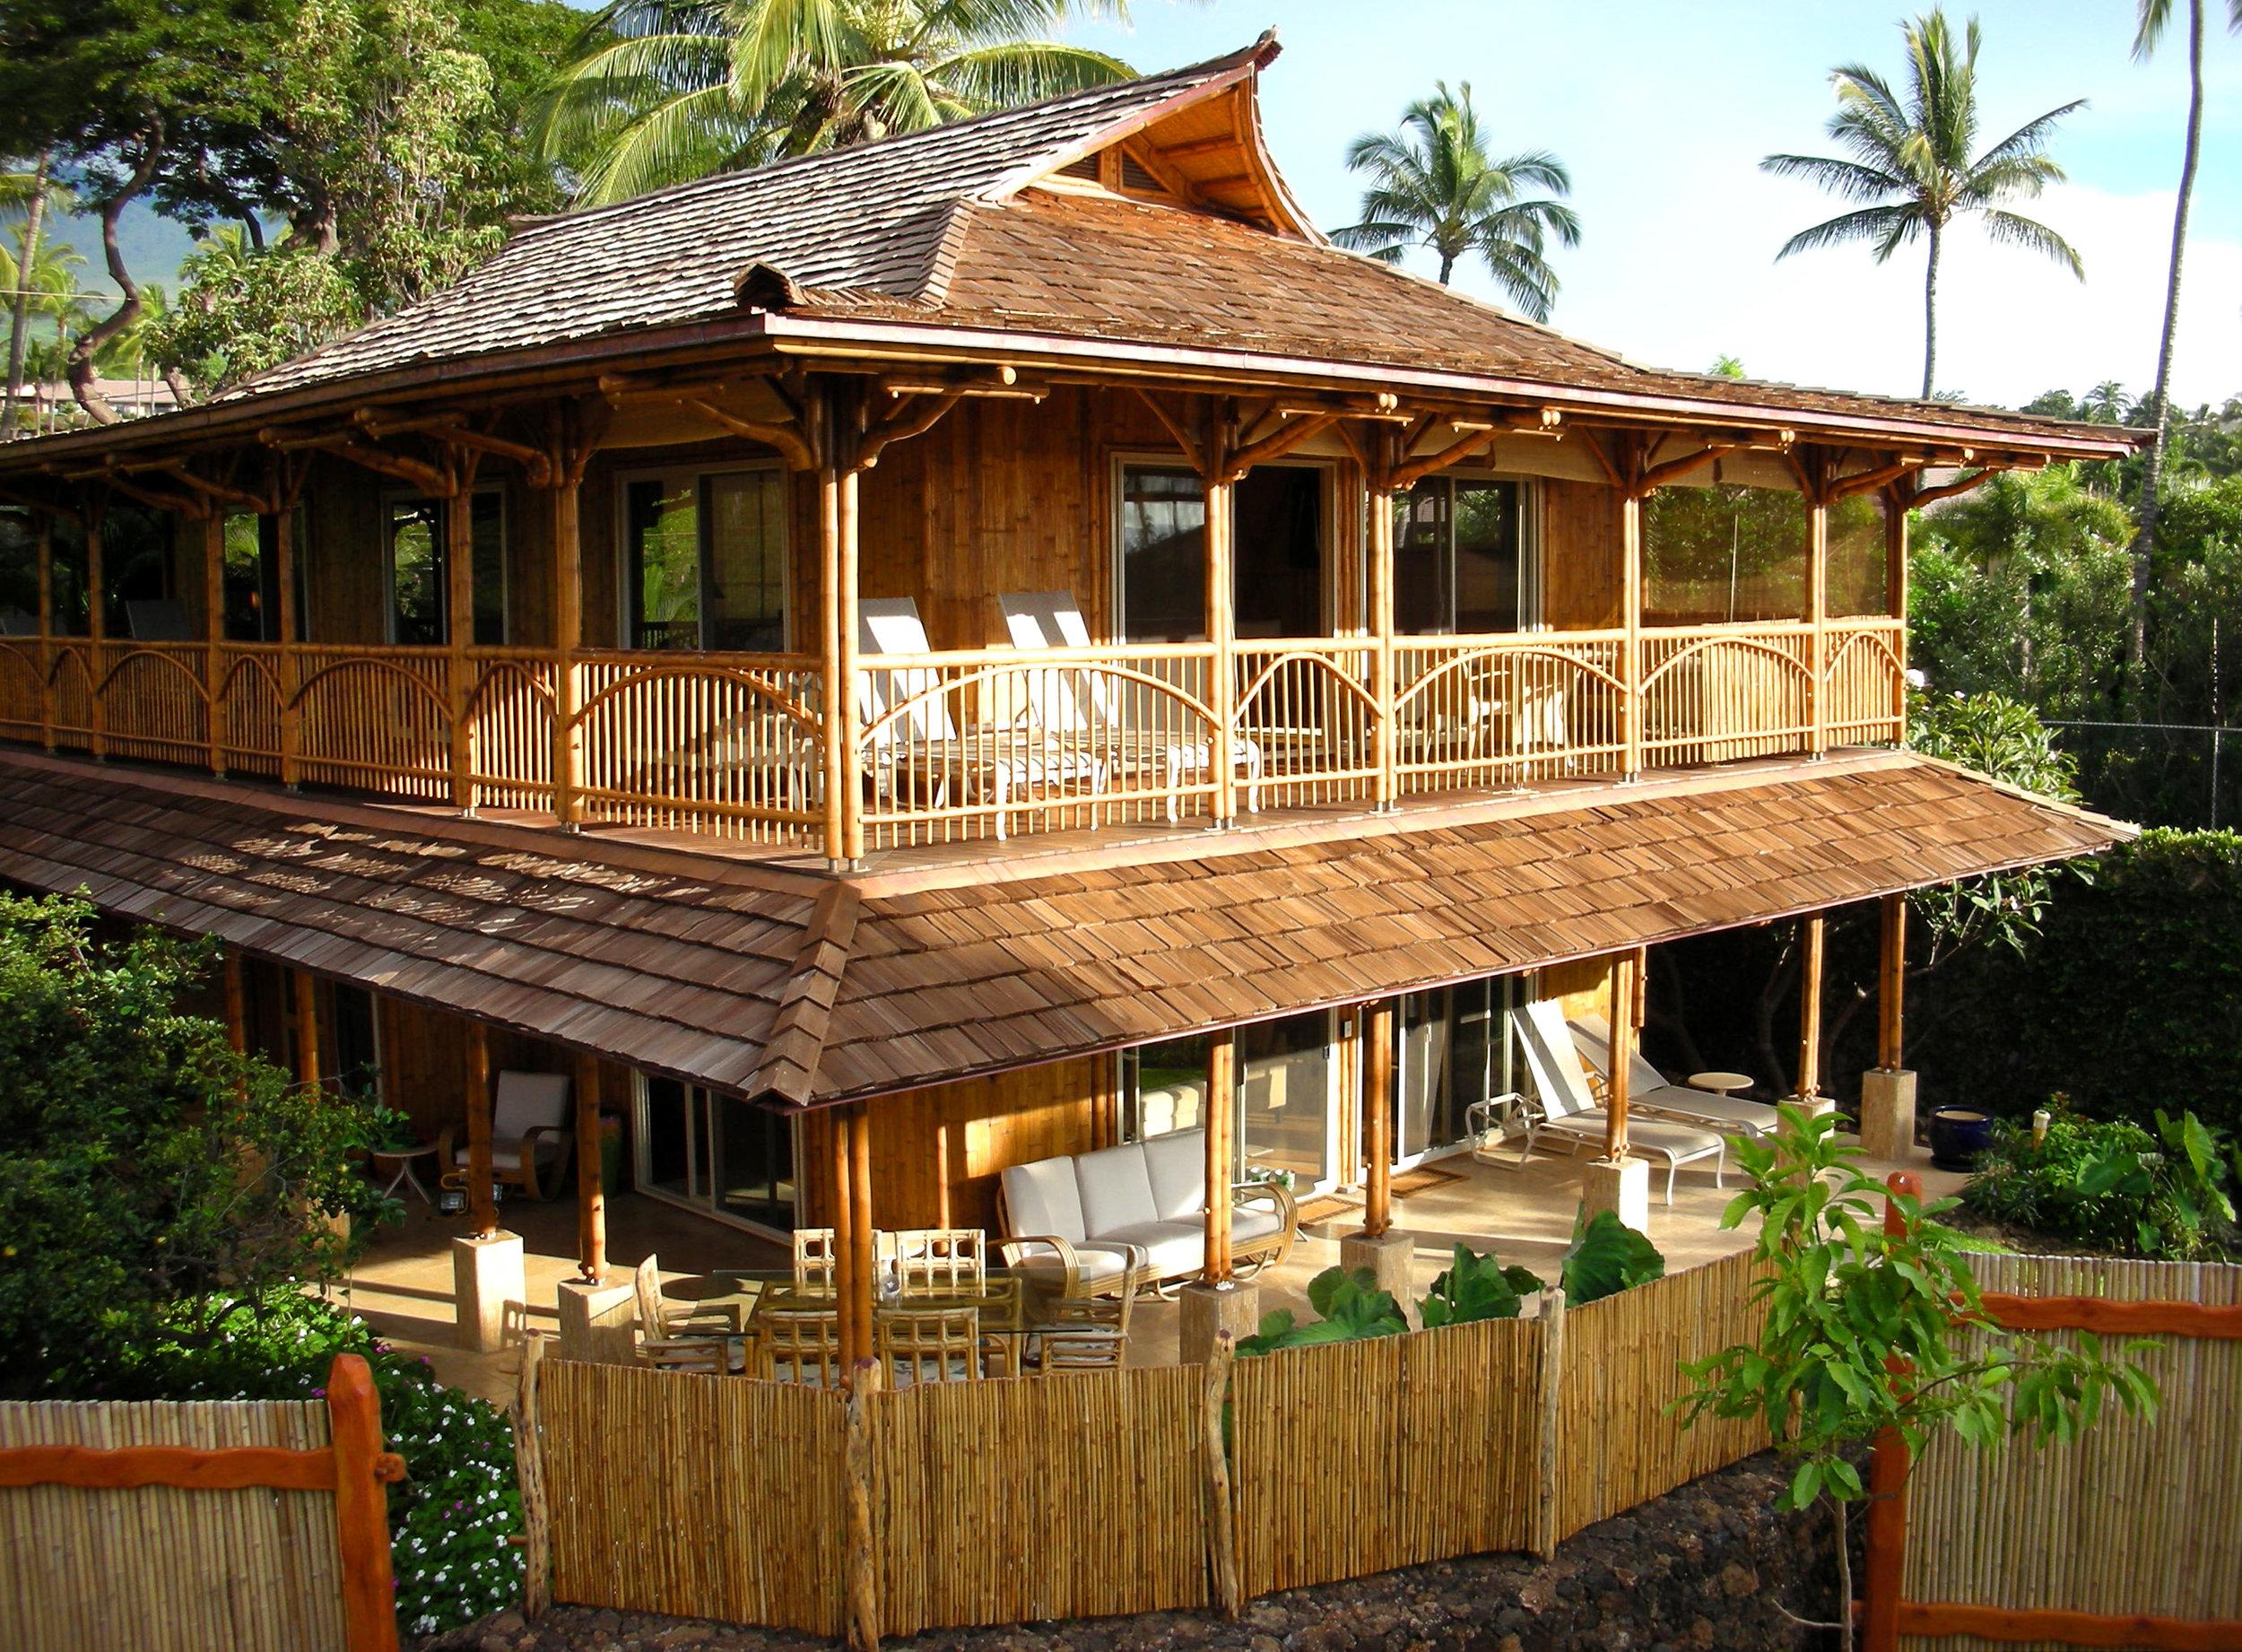 BL Home - Bali 2 Story 2.jpg